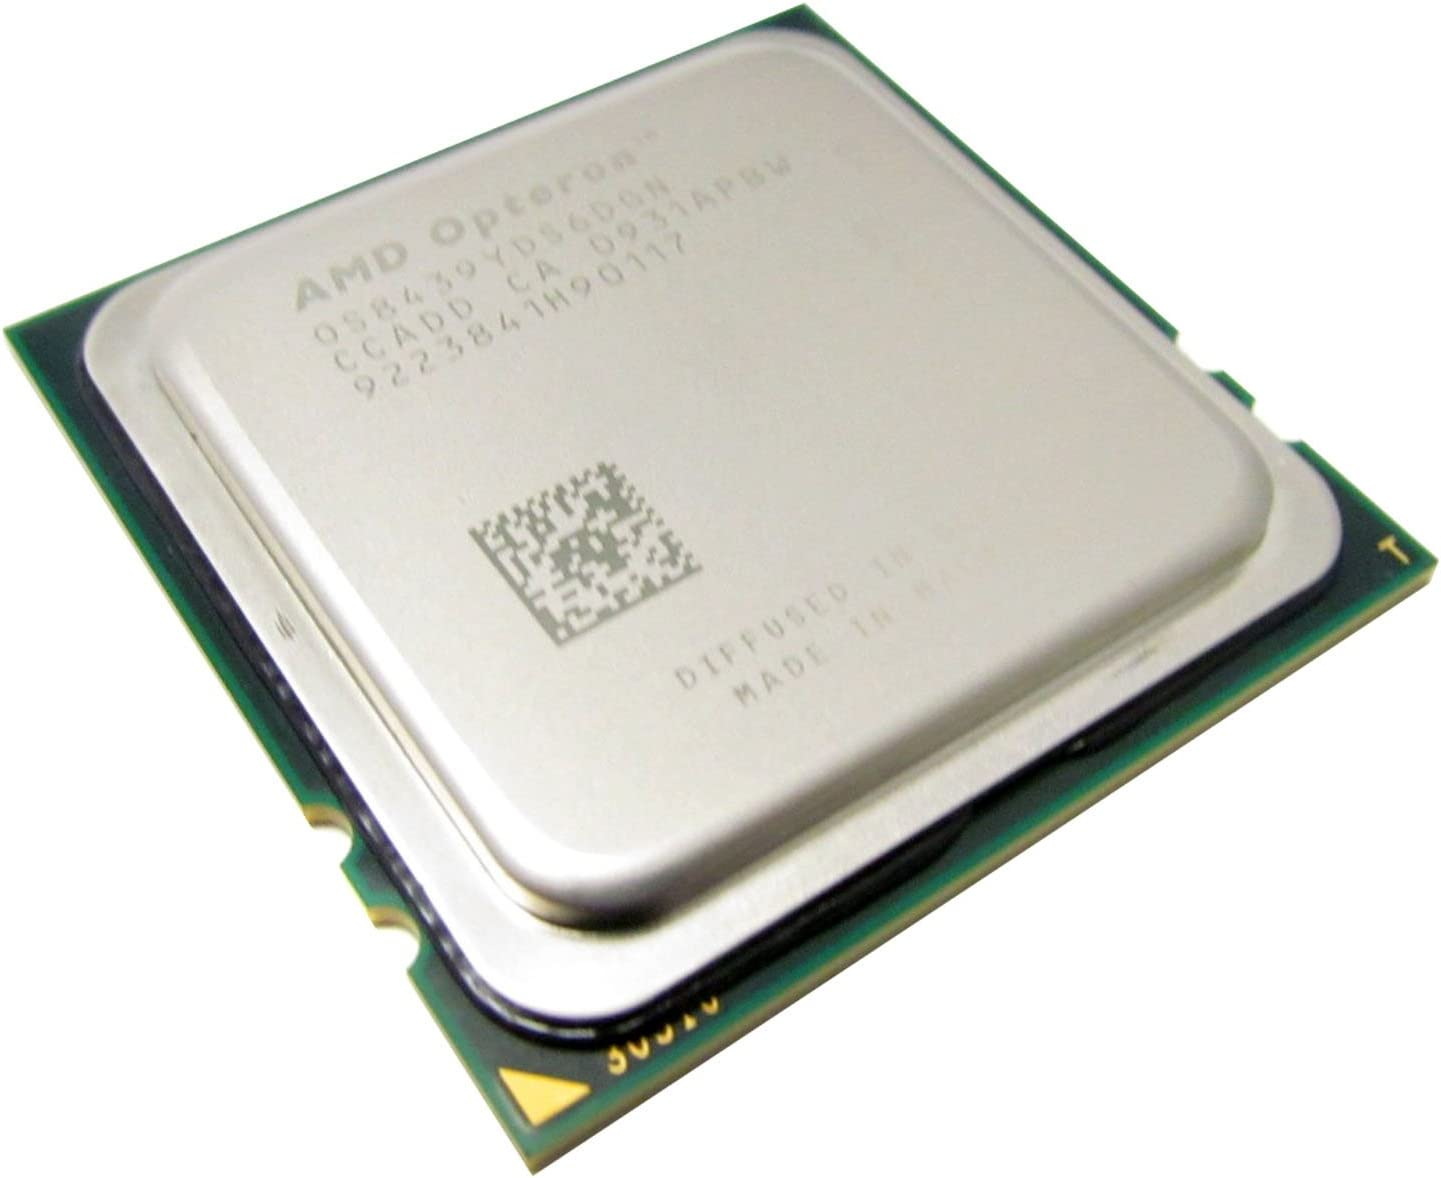 AMD OS8439YDS6DGN ISTANBUL X6 8439 SE F1207 2.8G 6MB 105W 4800MHZ 800DDR2 TRAY